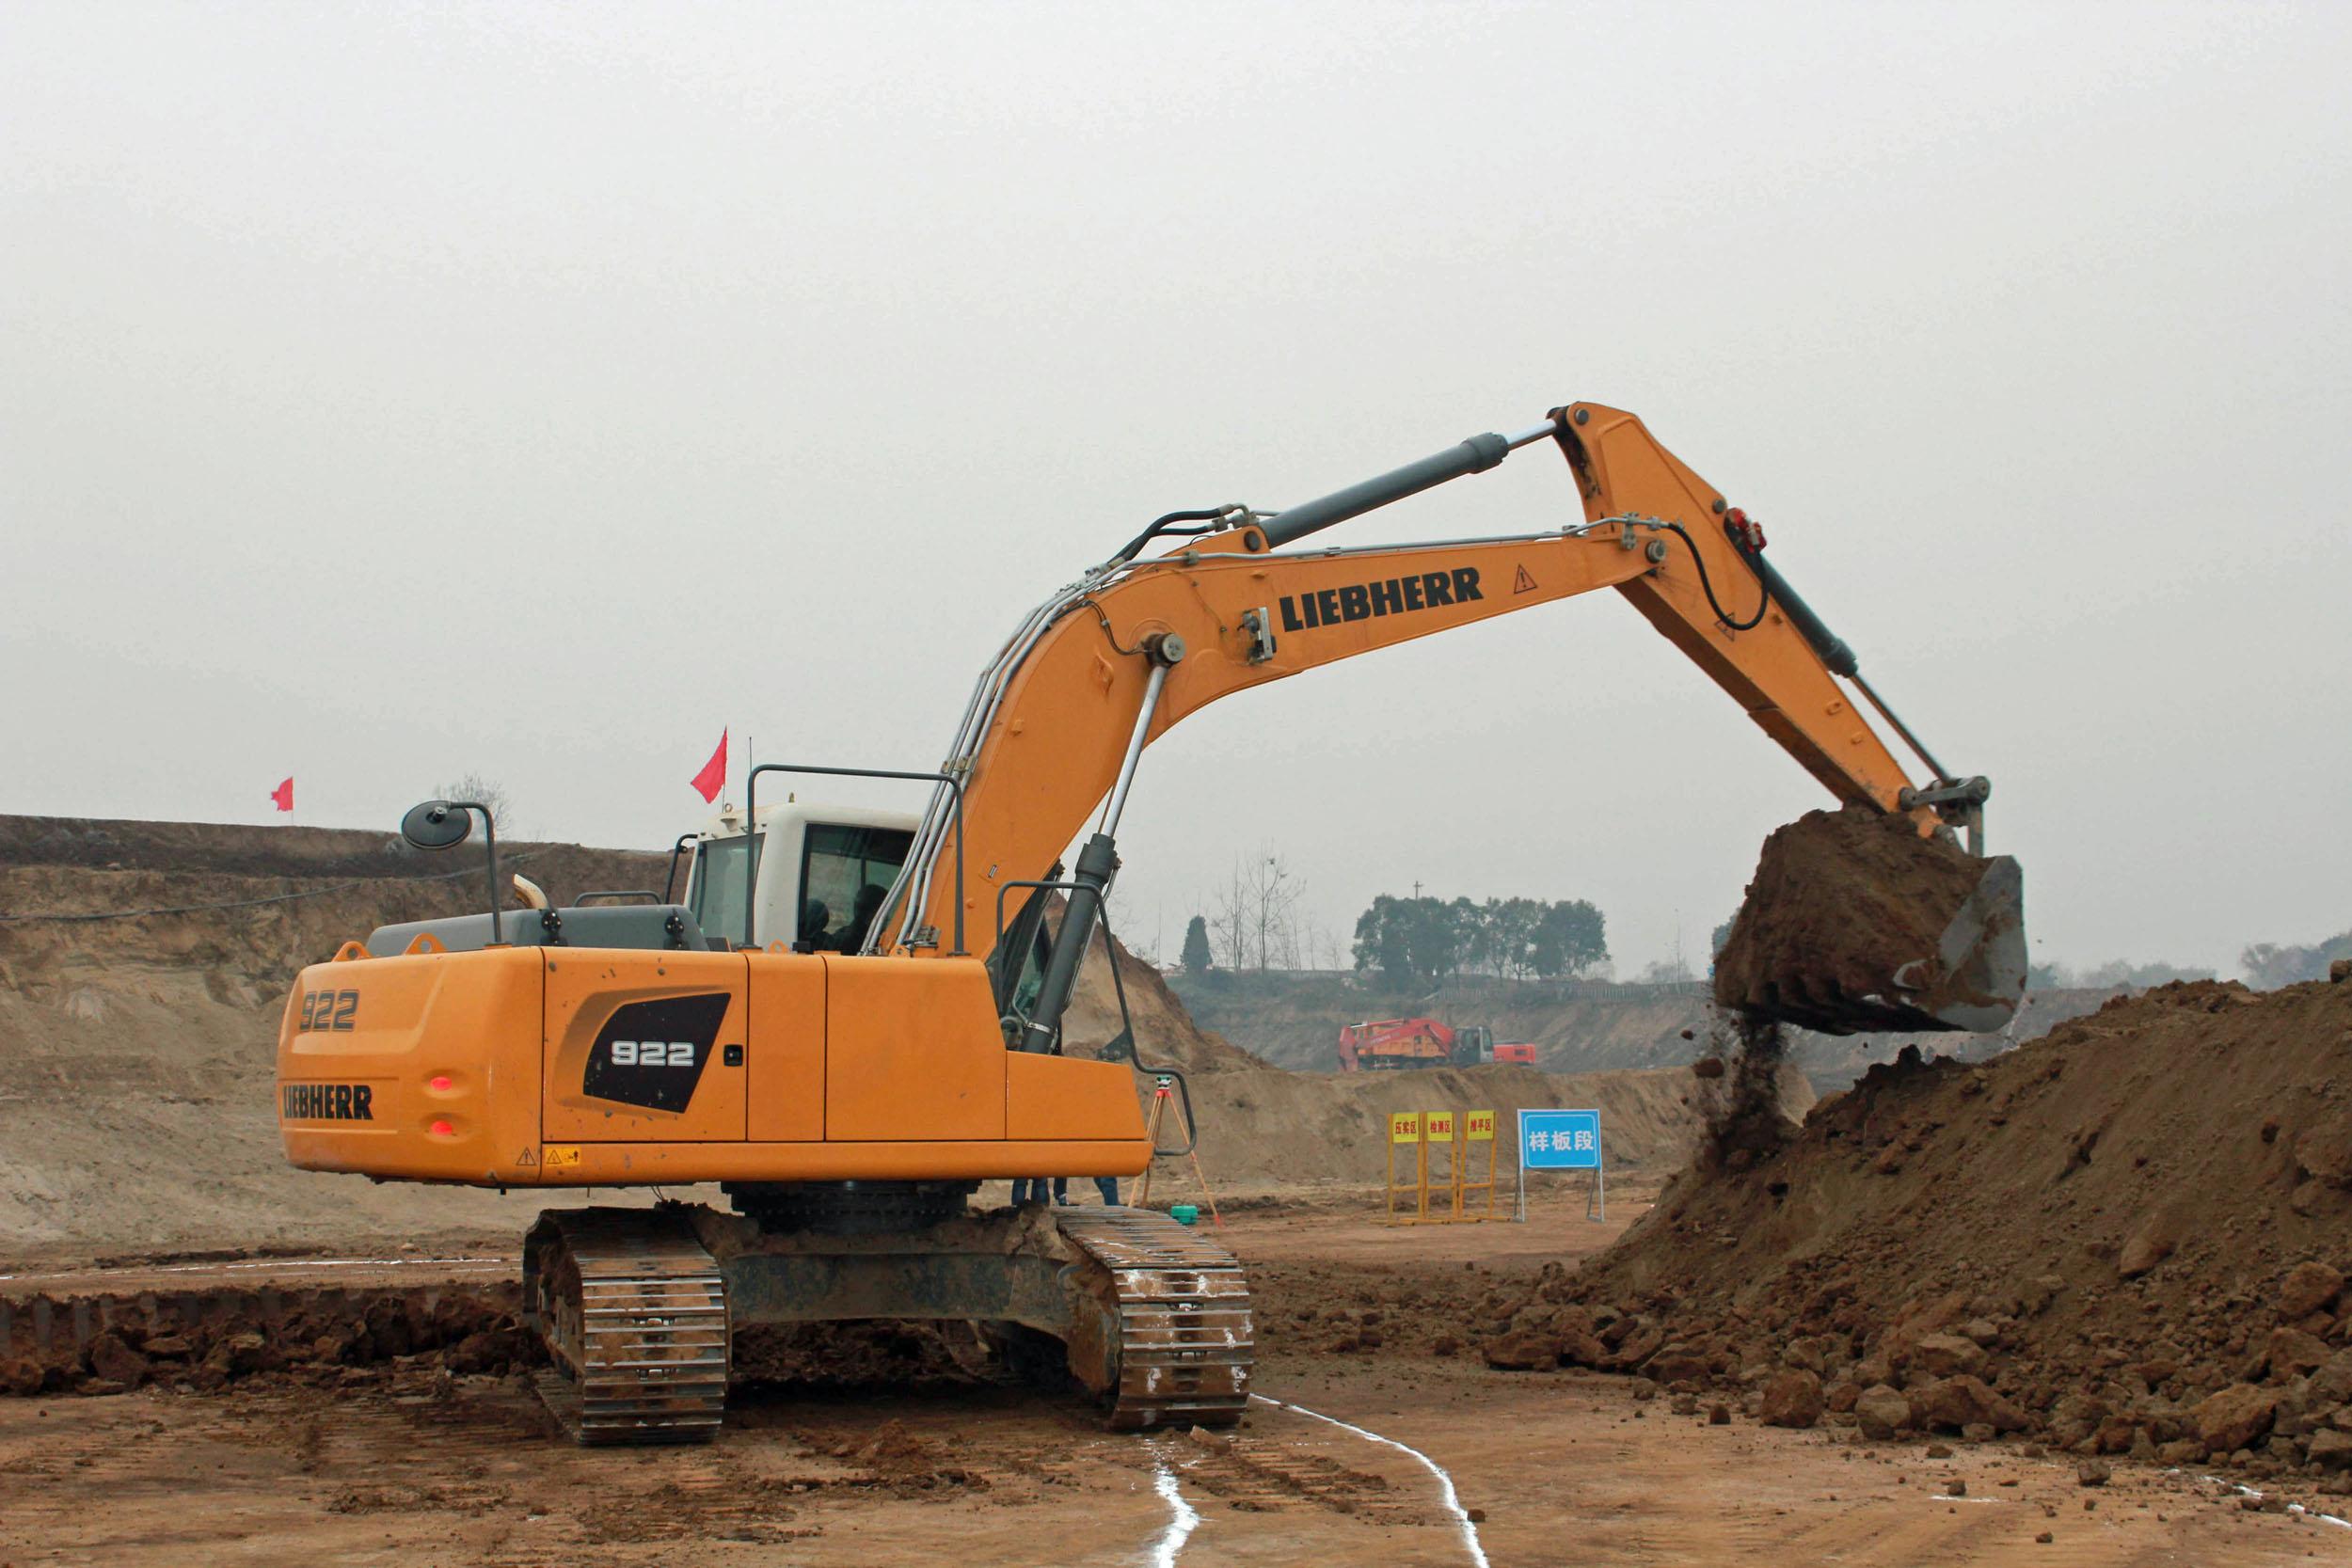 Esordio cinese per il Liebherr R922 -  -Notizie - MC5.0-Macchine Cantieri